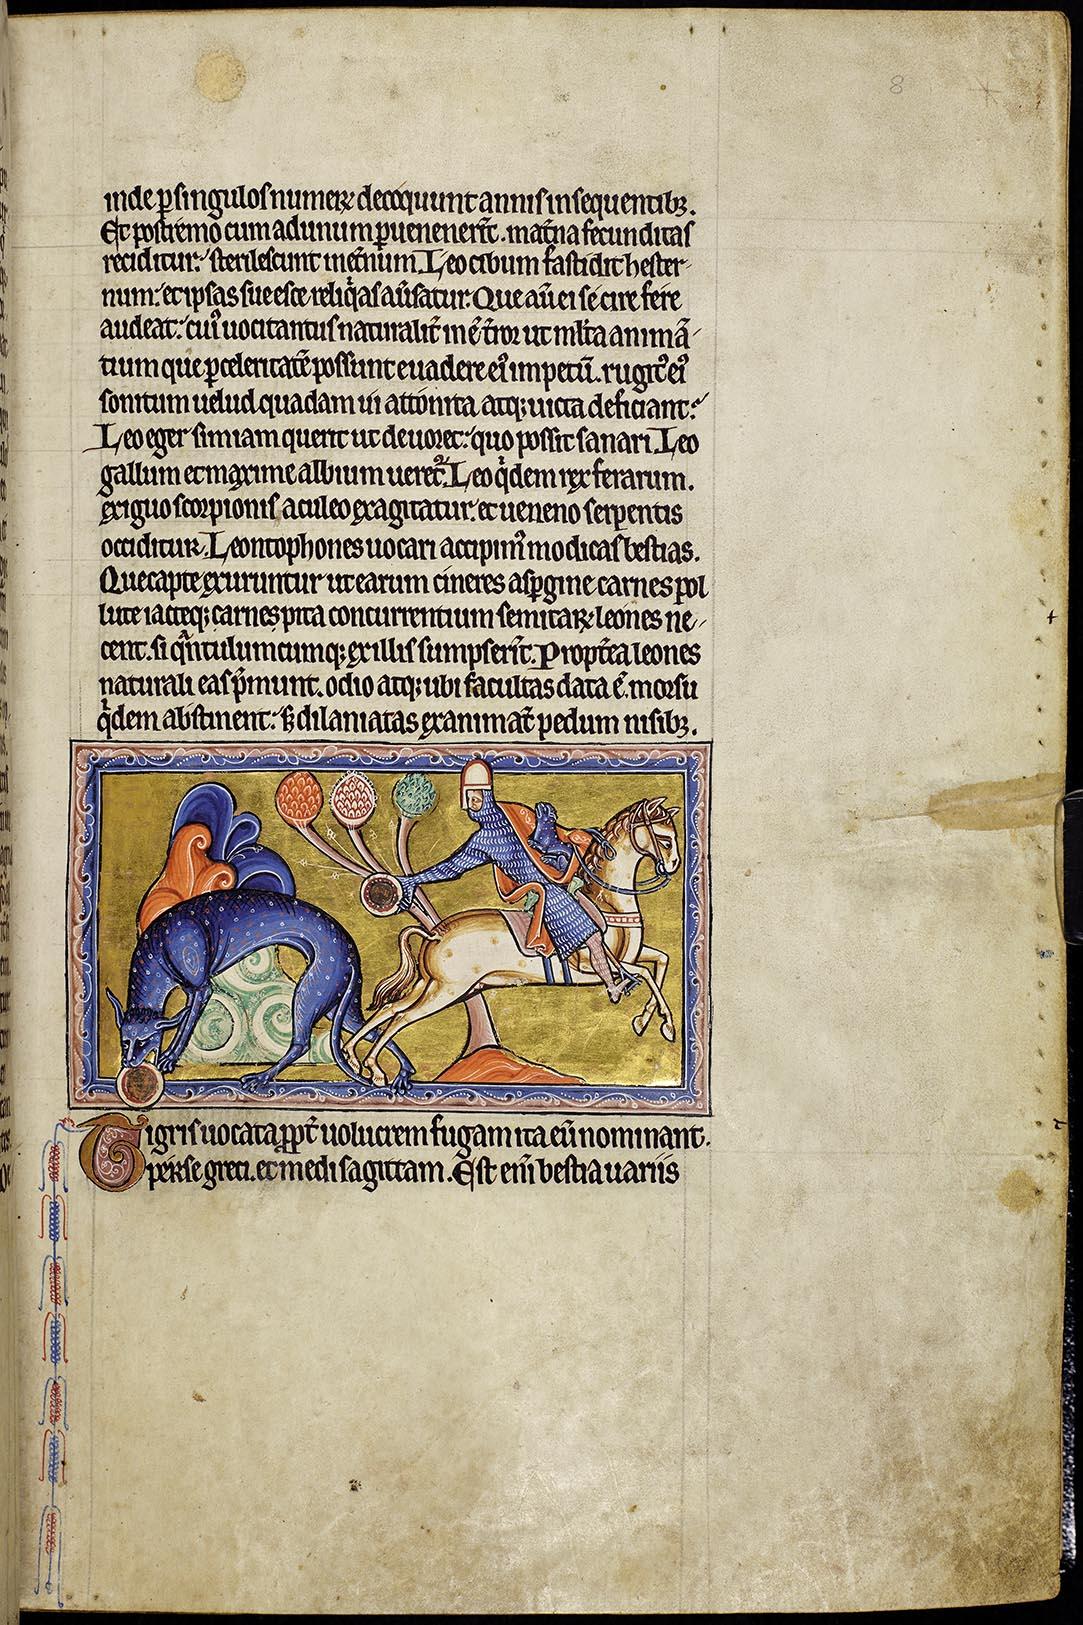 Aberdeen Bestiary, Folio 8r, Tiger, 12th century